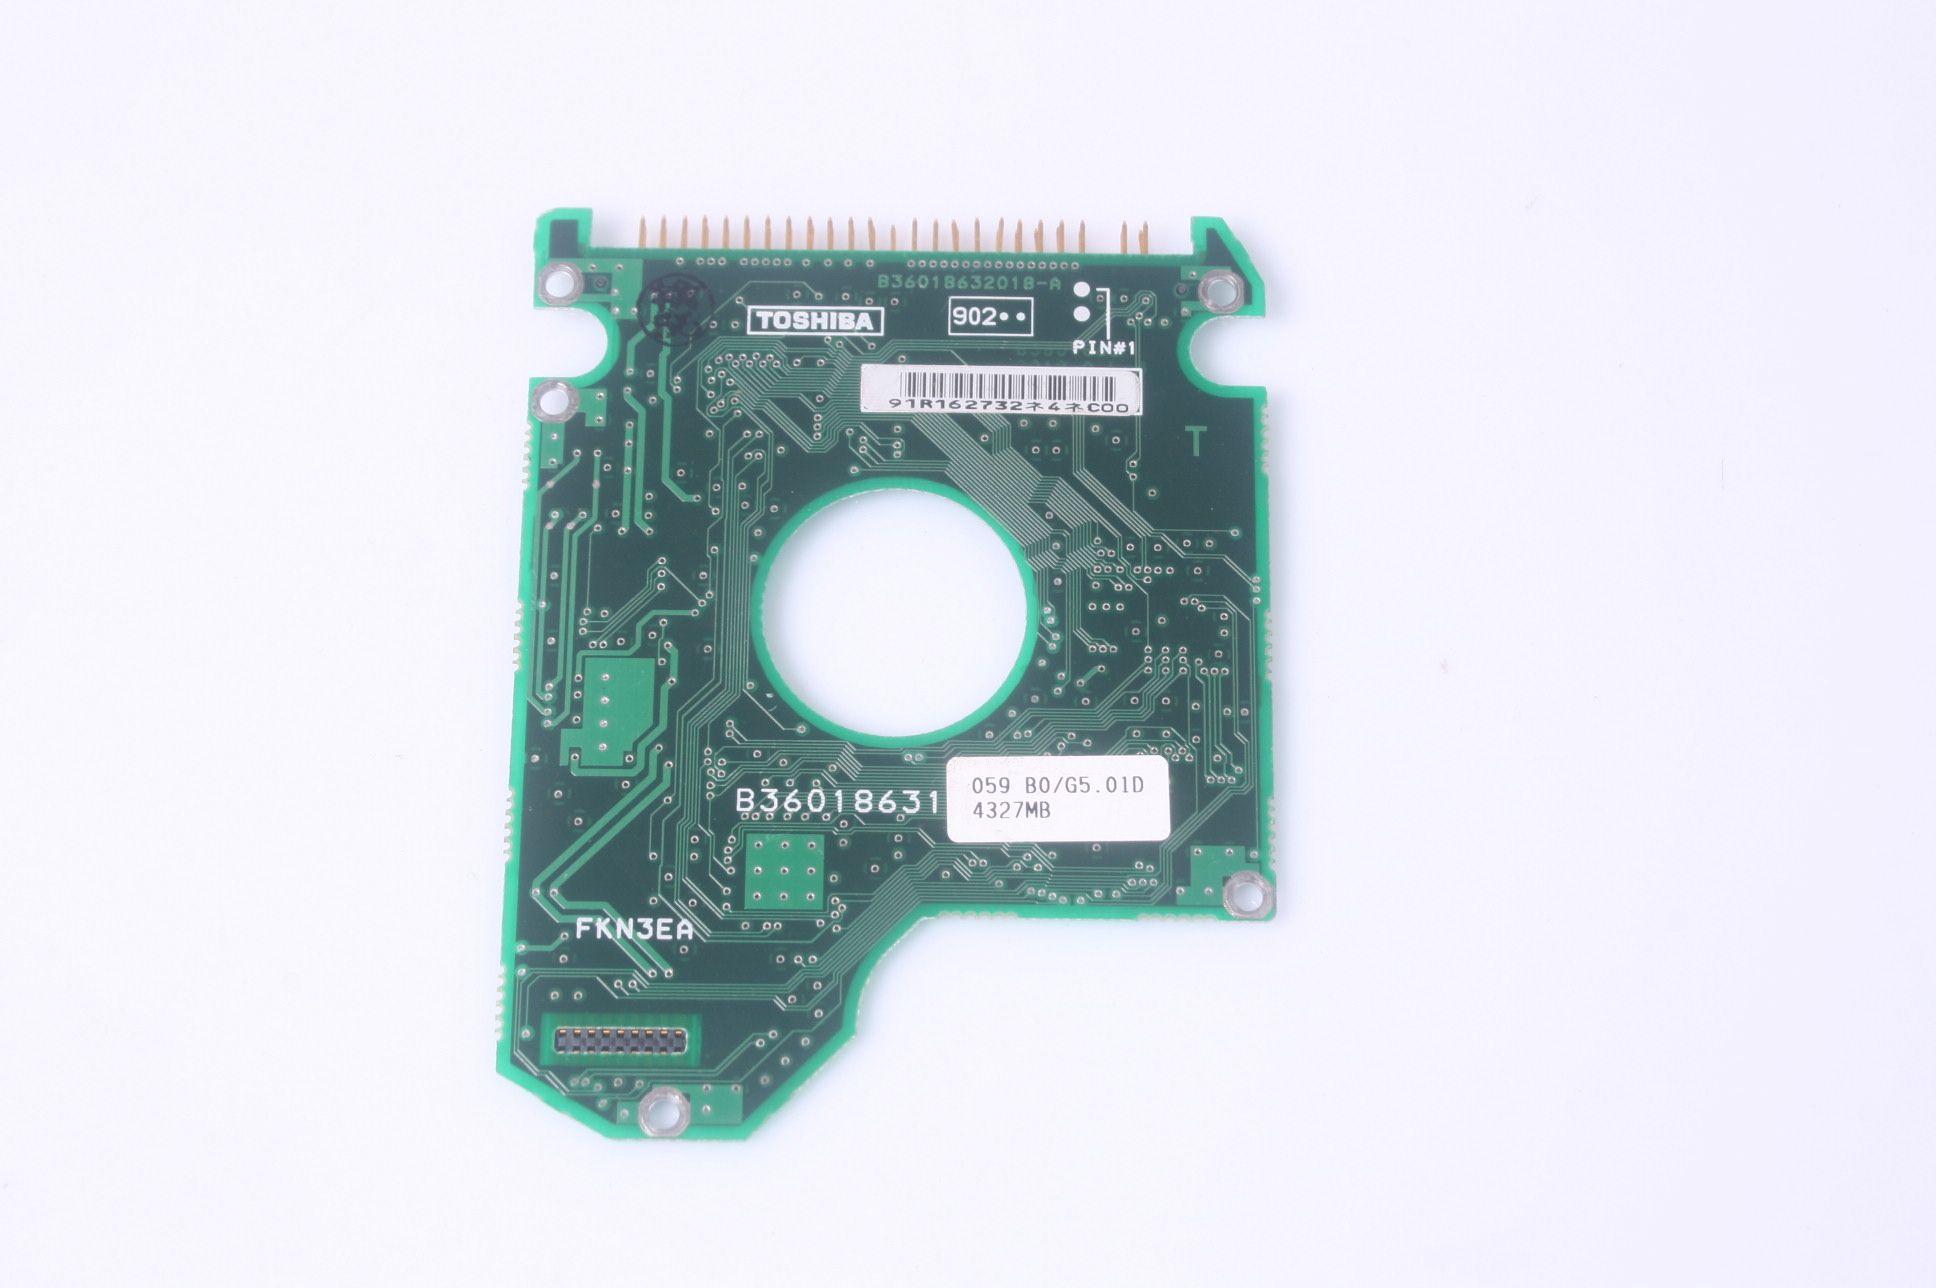 TOSHIBA MK4309MAT 4.3 GB 2.5 IDE HARD DRIVE / PCB (CIRCUIT BOARD) ONLY FOR DA